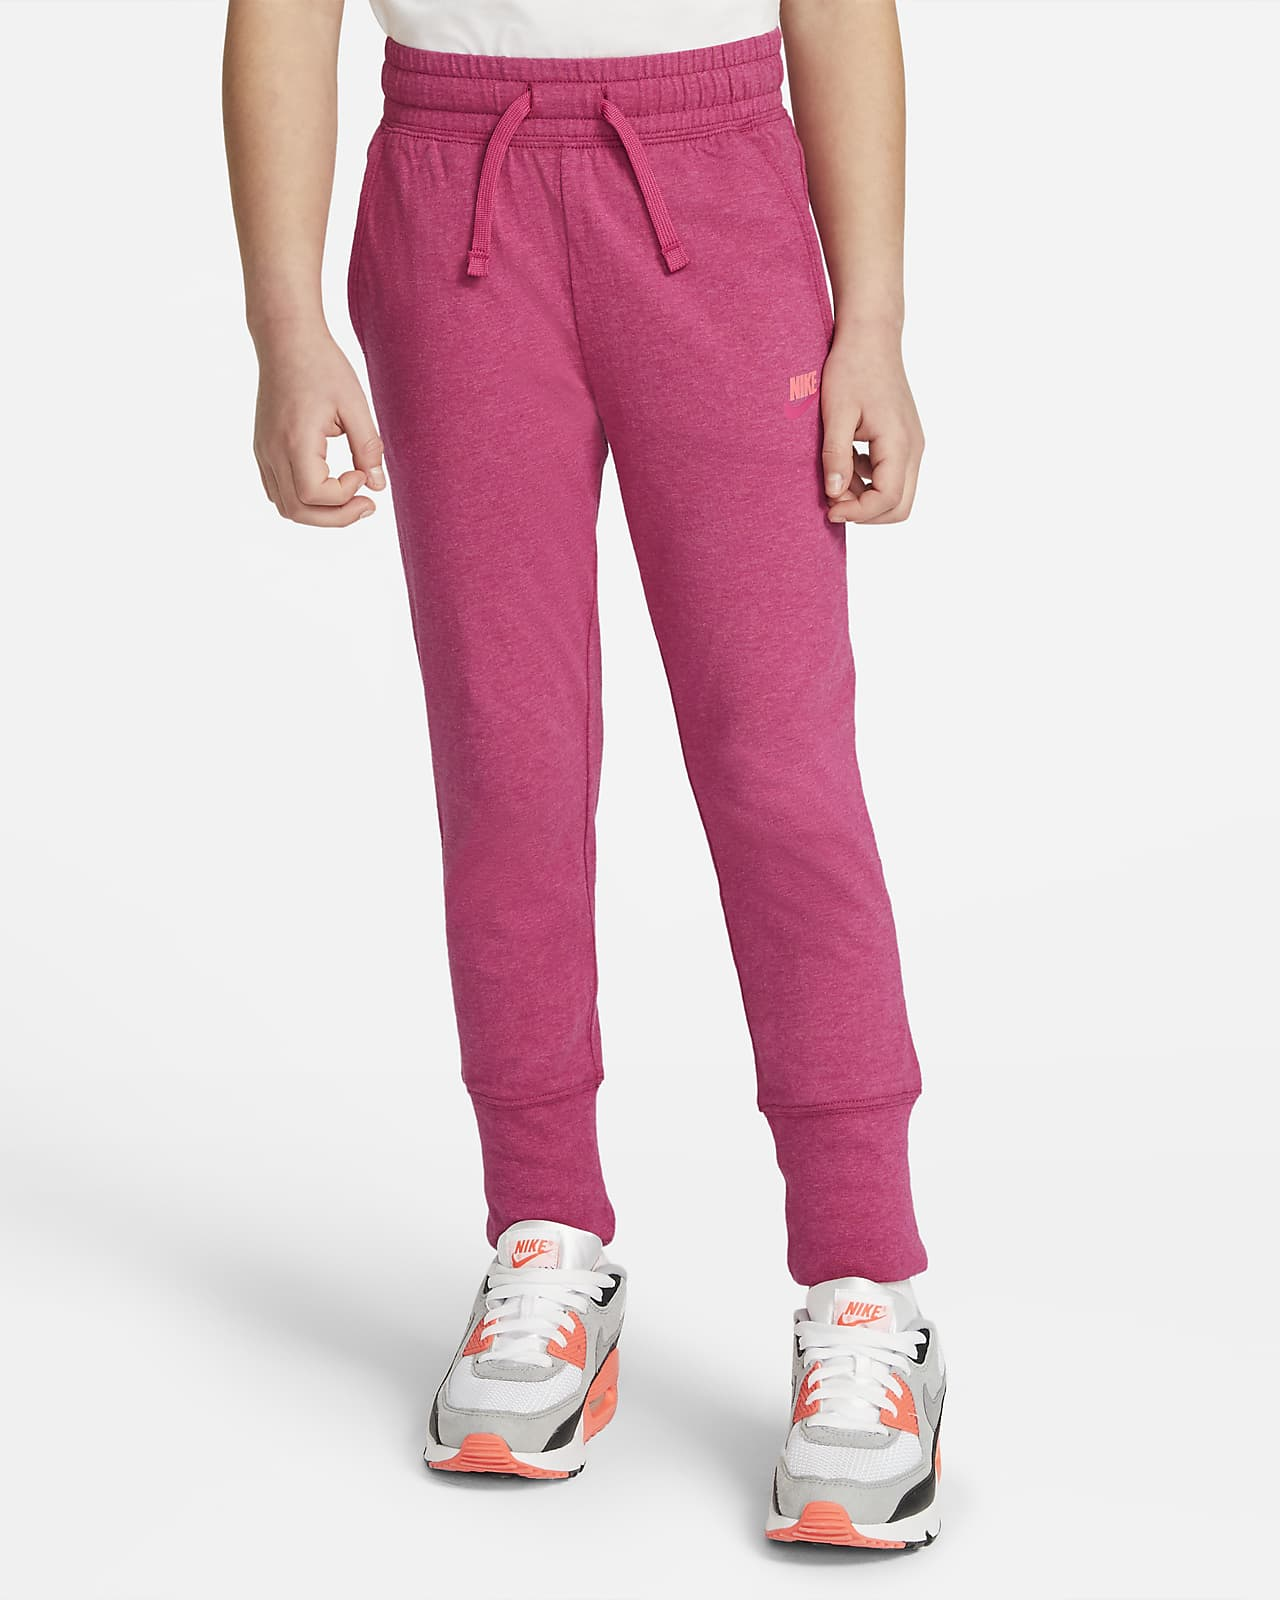 Nike Little Kids' Pants